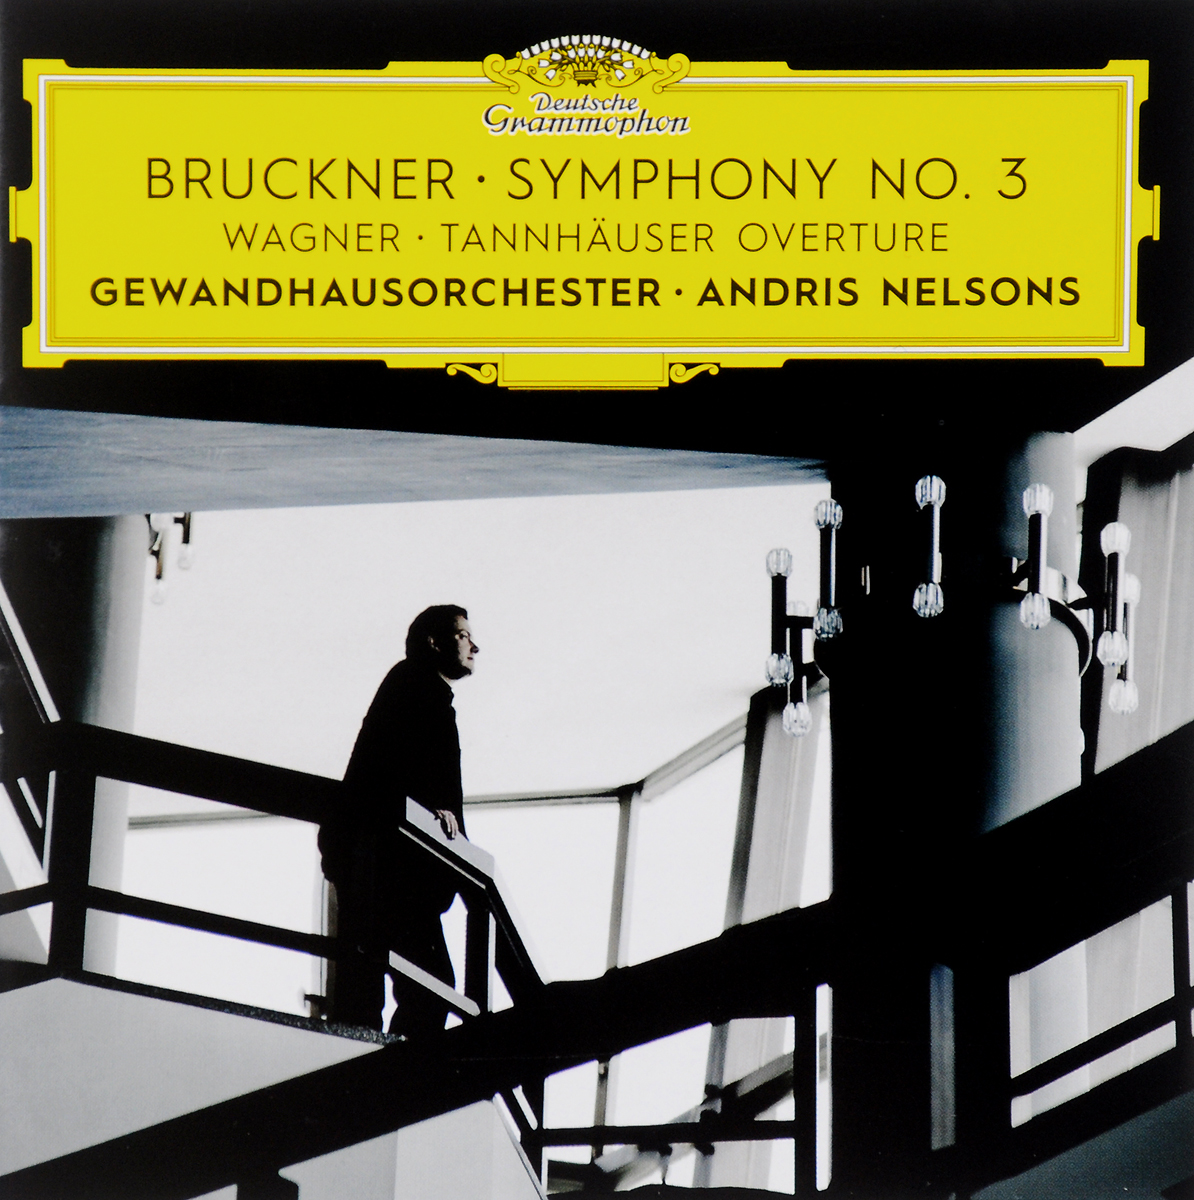 Андрис Нельсон,Gewandhausorchester Leipzig Andris Nelsons, Gewandhausorchester Leipzig. Bruckner. Symphony No. 3 / Wagner. Tannhauser Overture